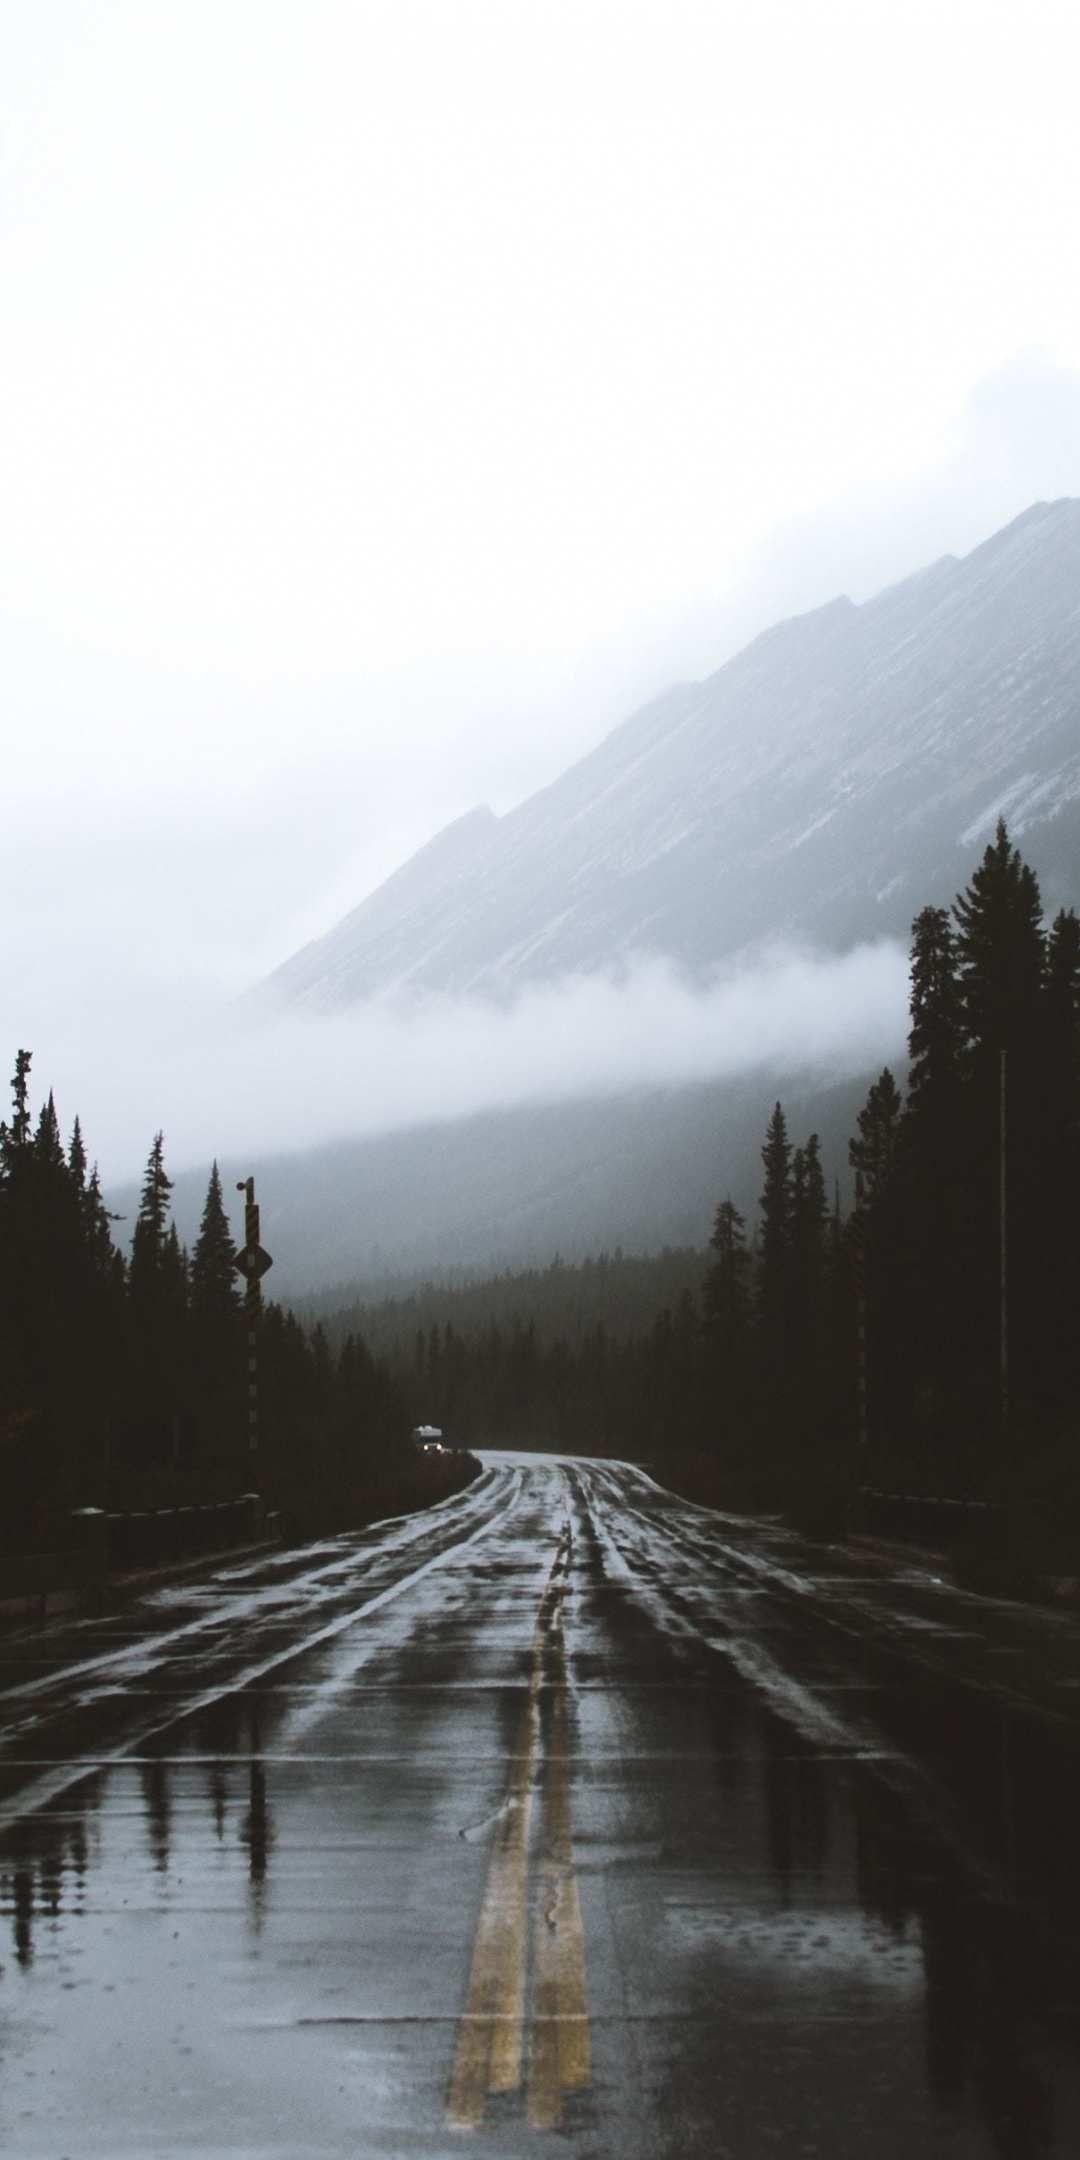 Alberta Canada road rainy day iPhone Wallpaper Iphone wallpaper